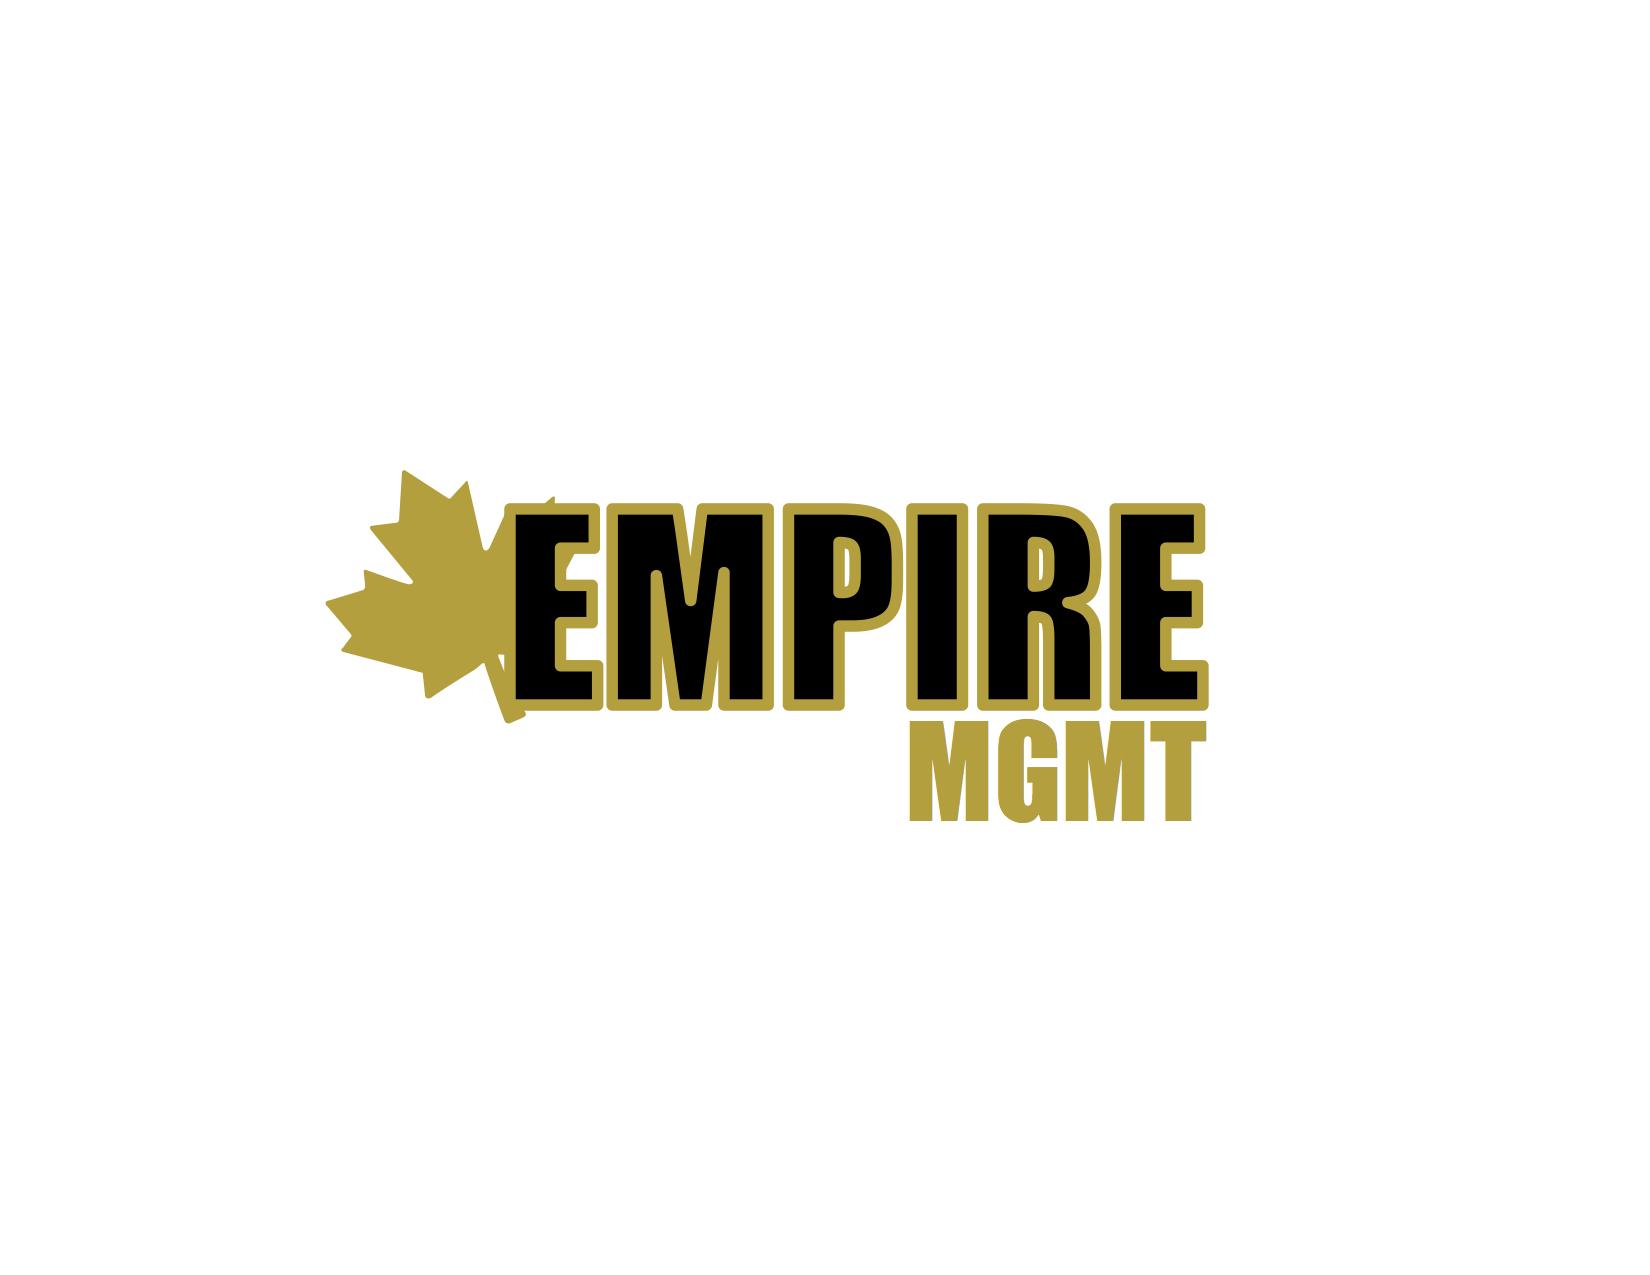 EMPIRE MGMT